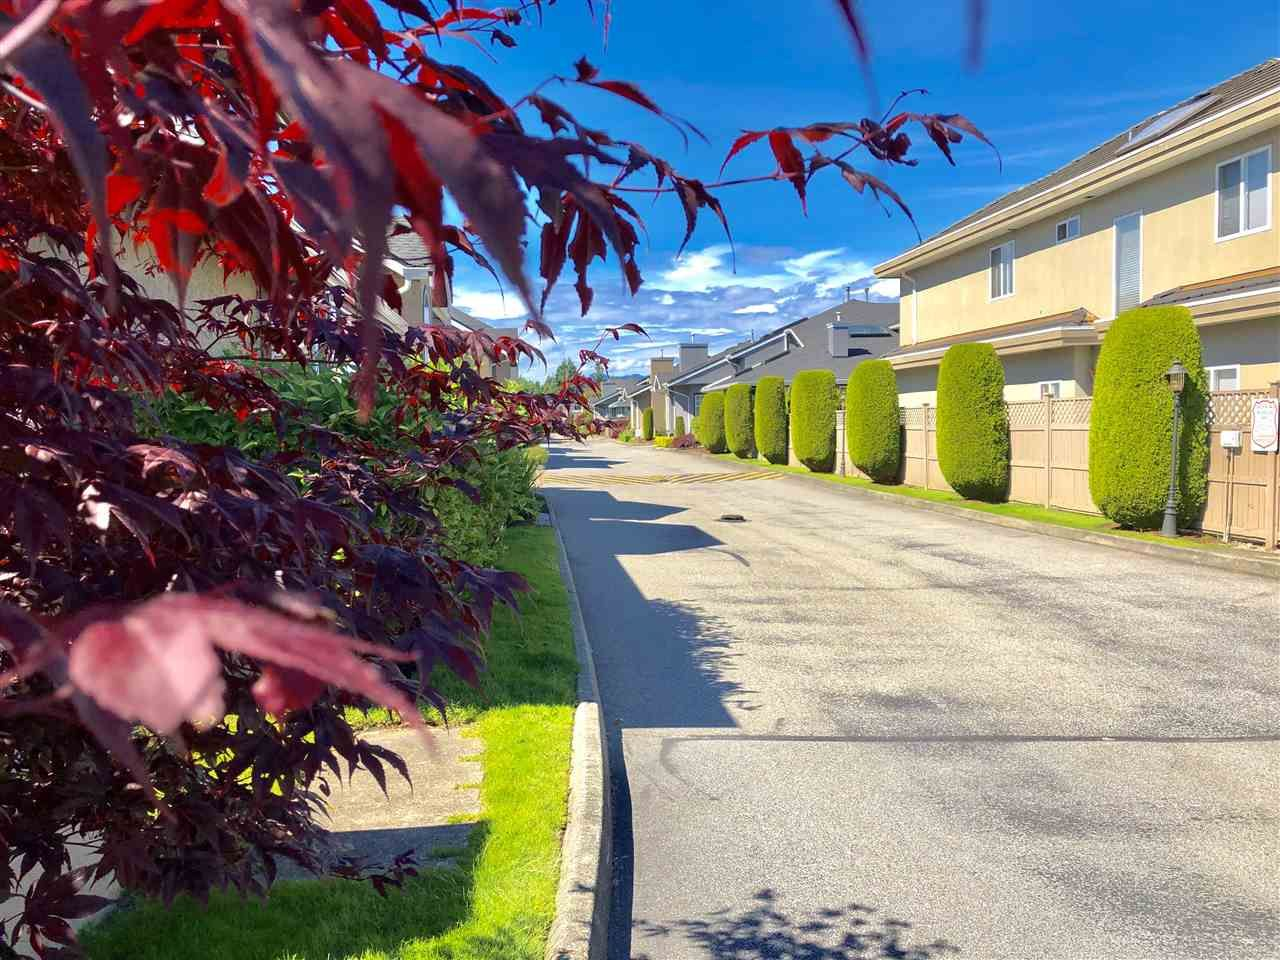 Main Photo: 16 9311 DAYTON AVENUE in : Garden City Townhouse for sale : MLS®# R2379701